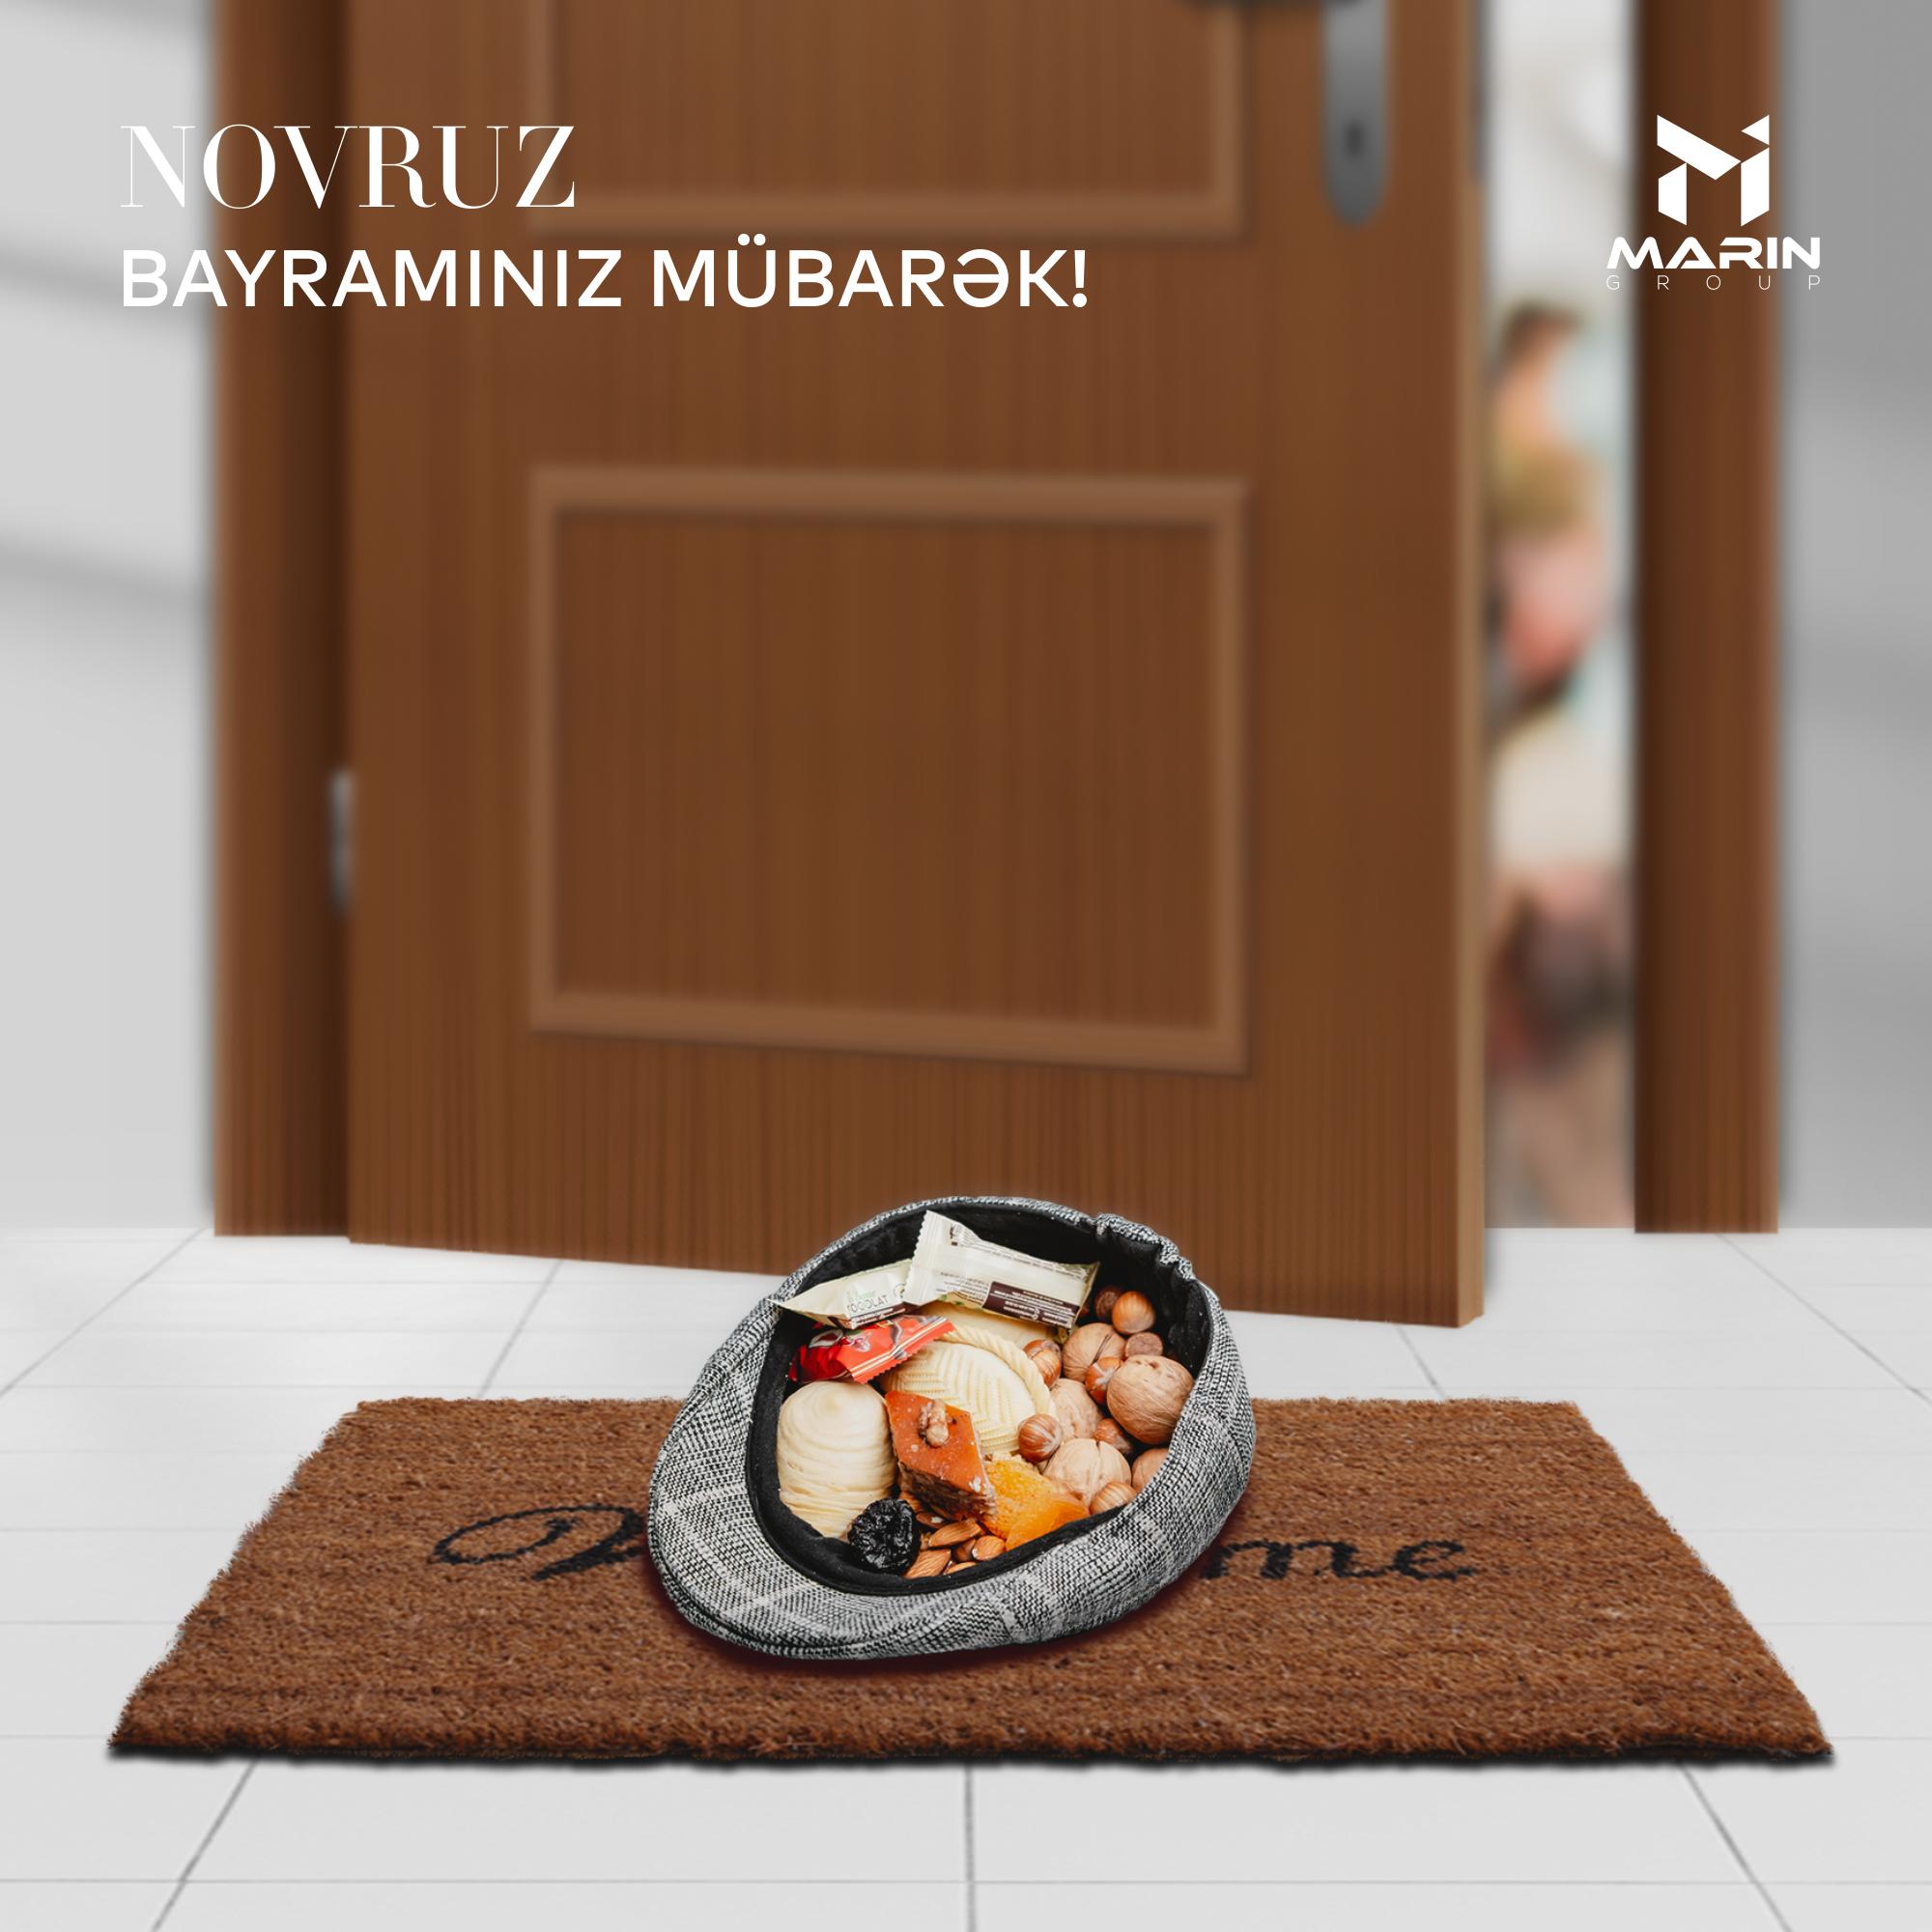 Novruz Bayraminiz Mubarək In 2021 Home Decor Decor Door Mat